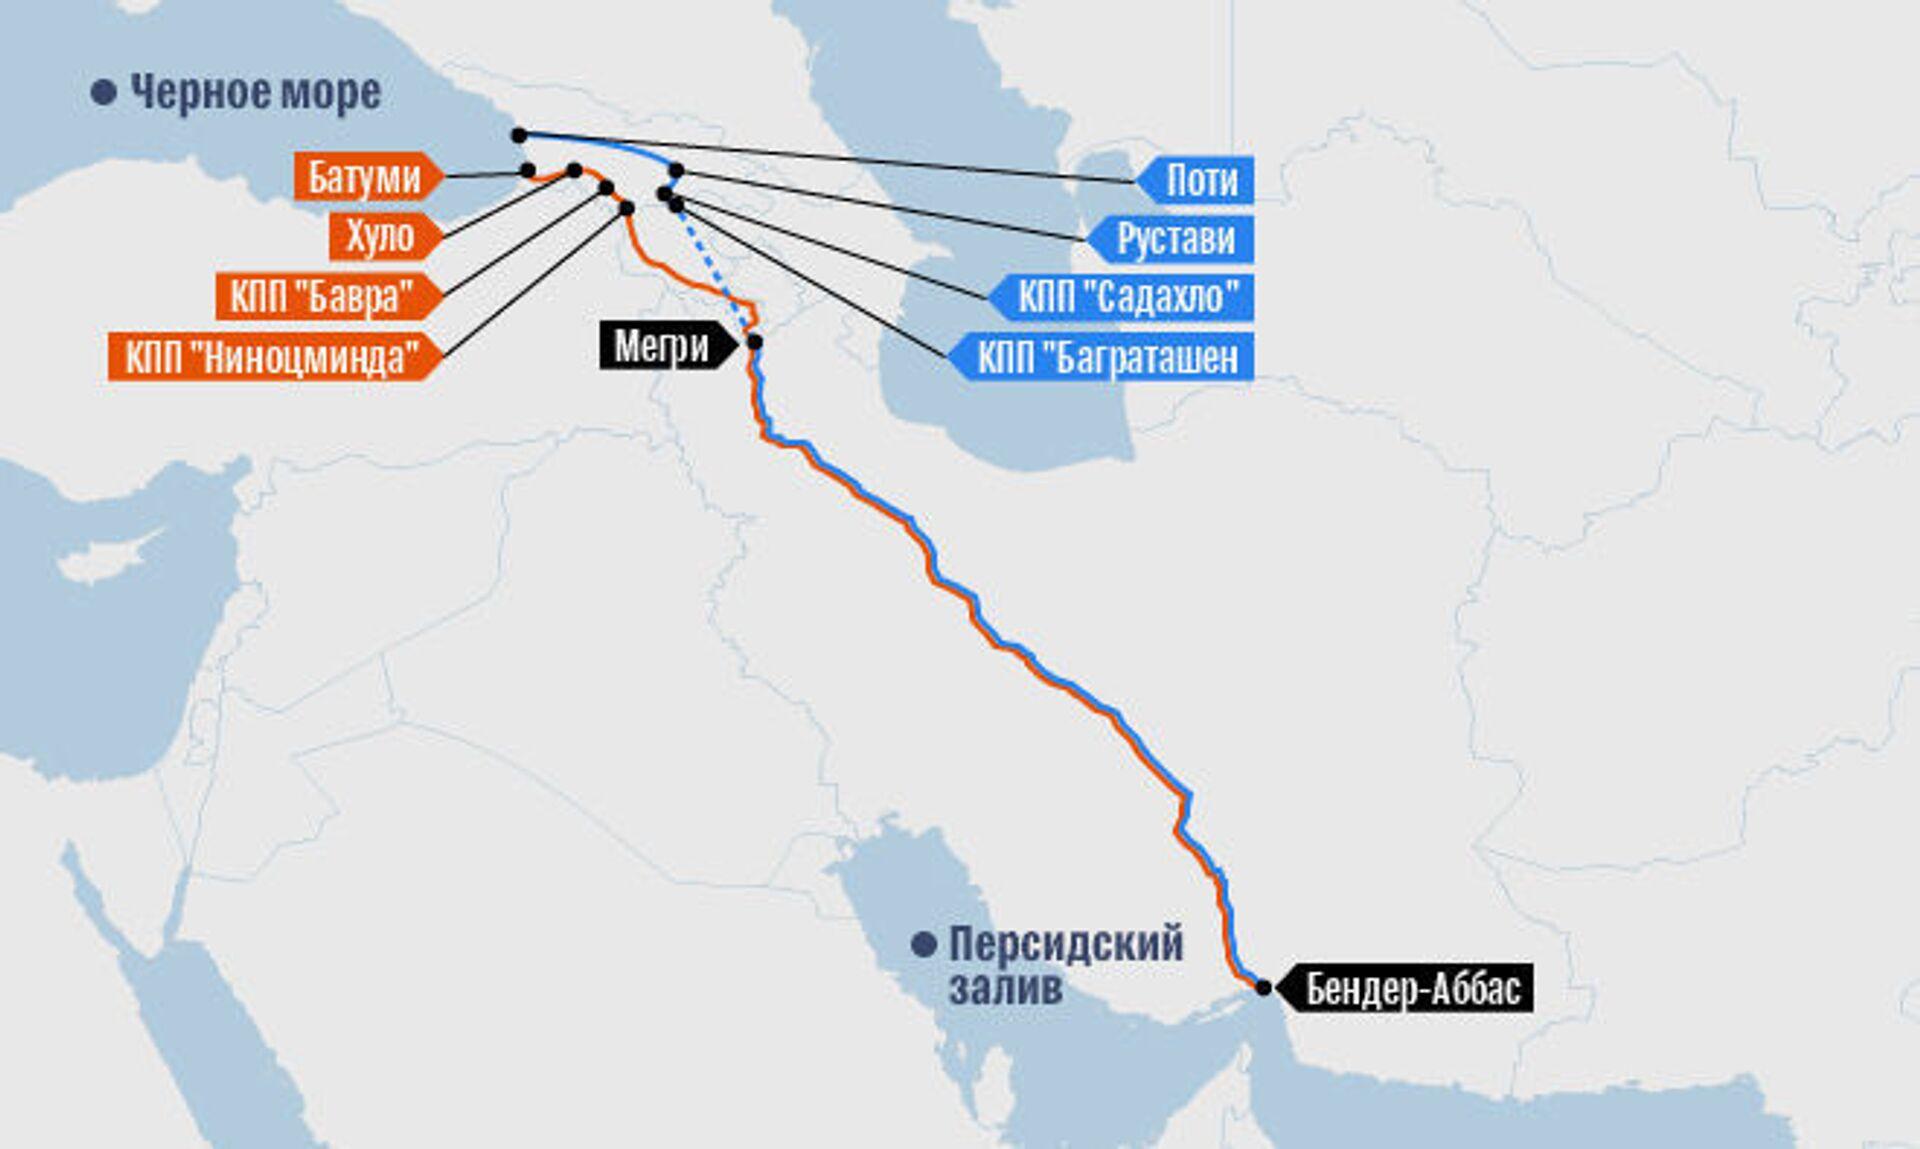 Коридор Персидский залив – Черное море: Тегеран делает ставку на Ереван, а не на Баку - Sputnik Армения, 1920, 19.05.2021